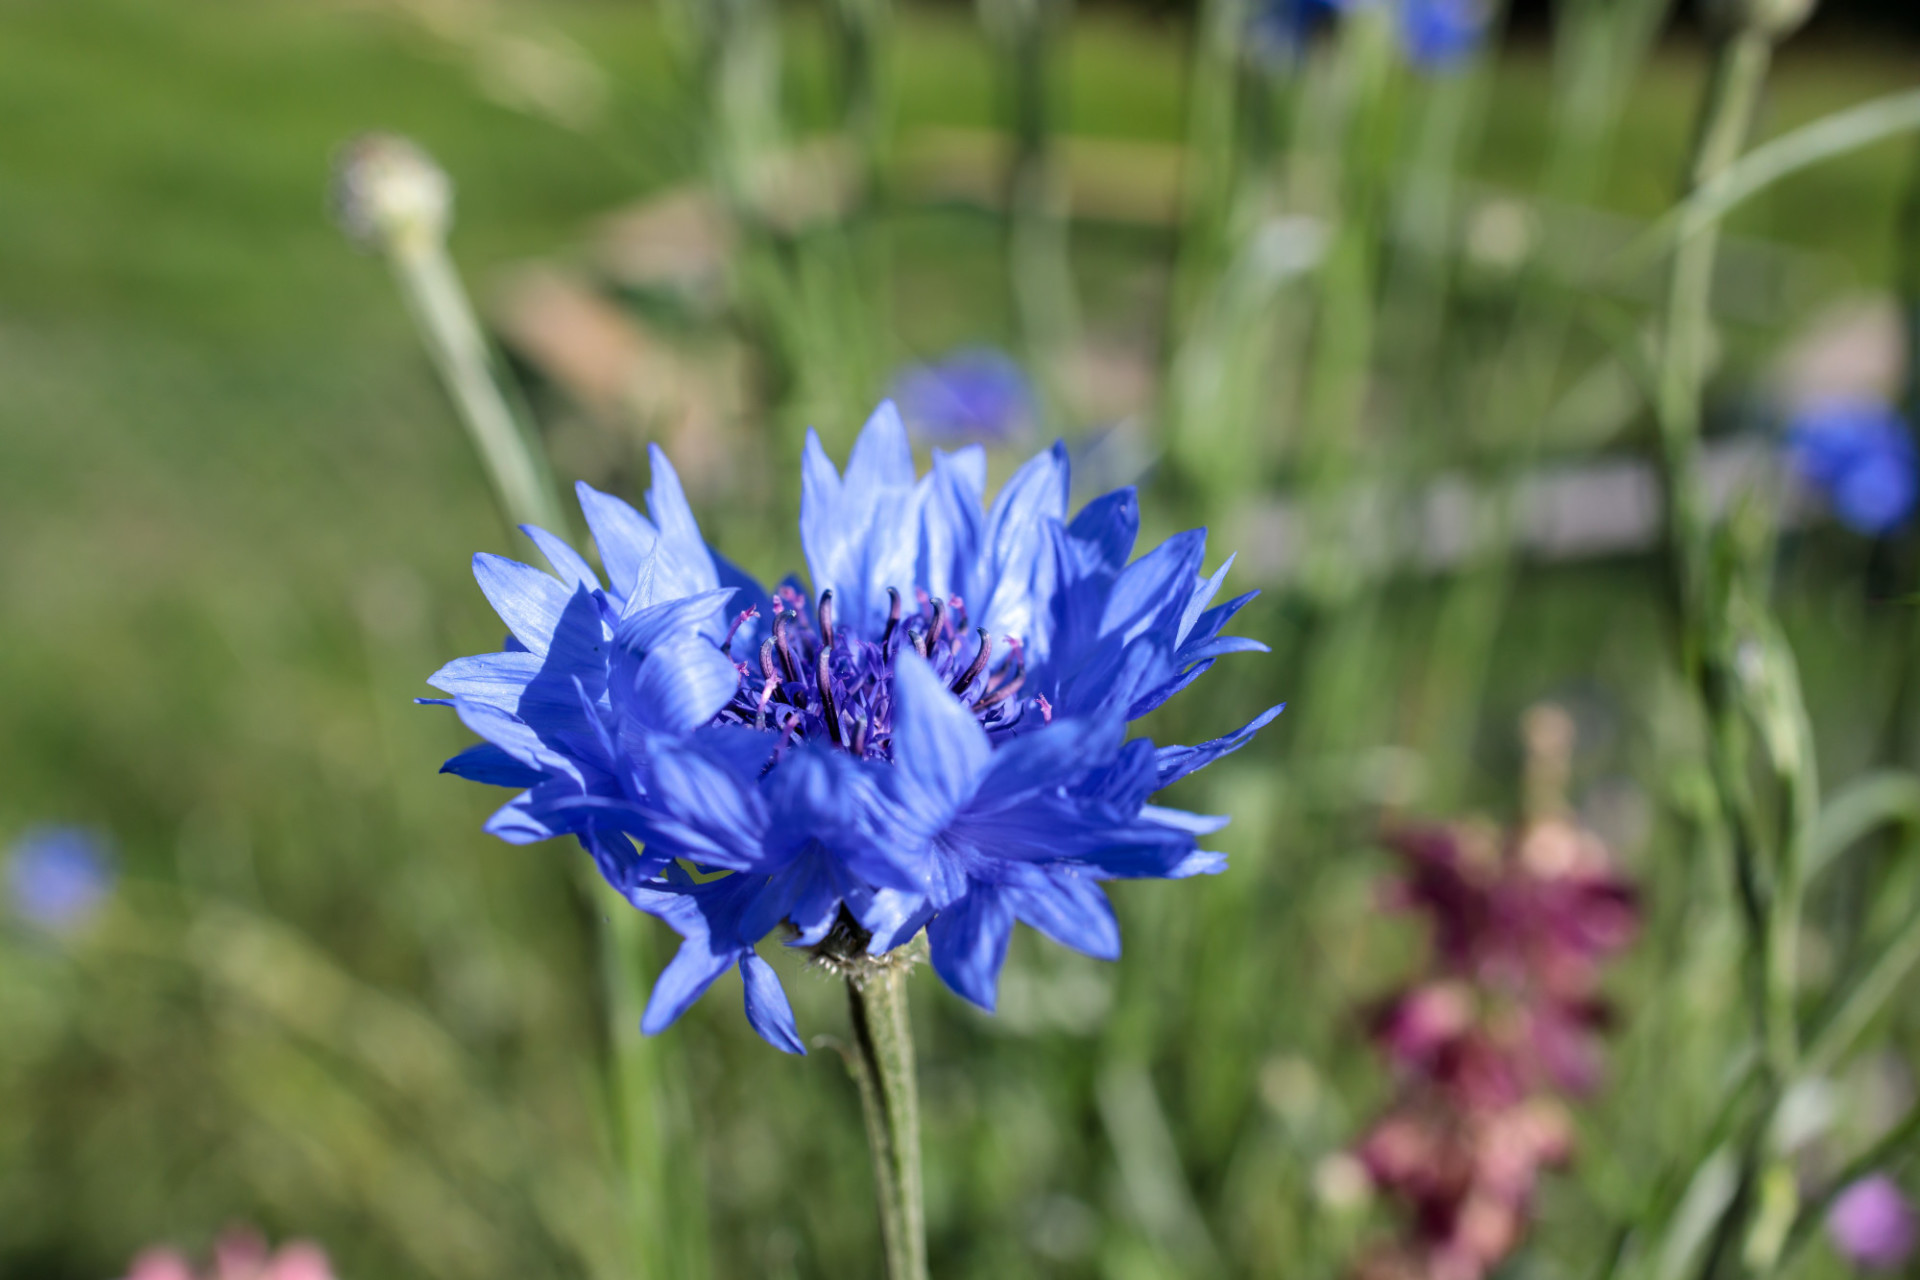 Centaurea montana, the perennial cornflower